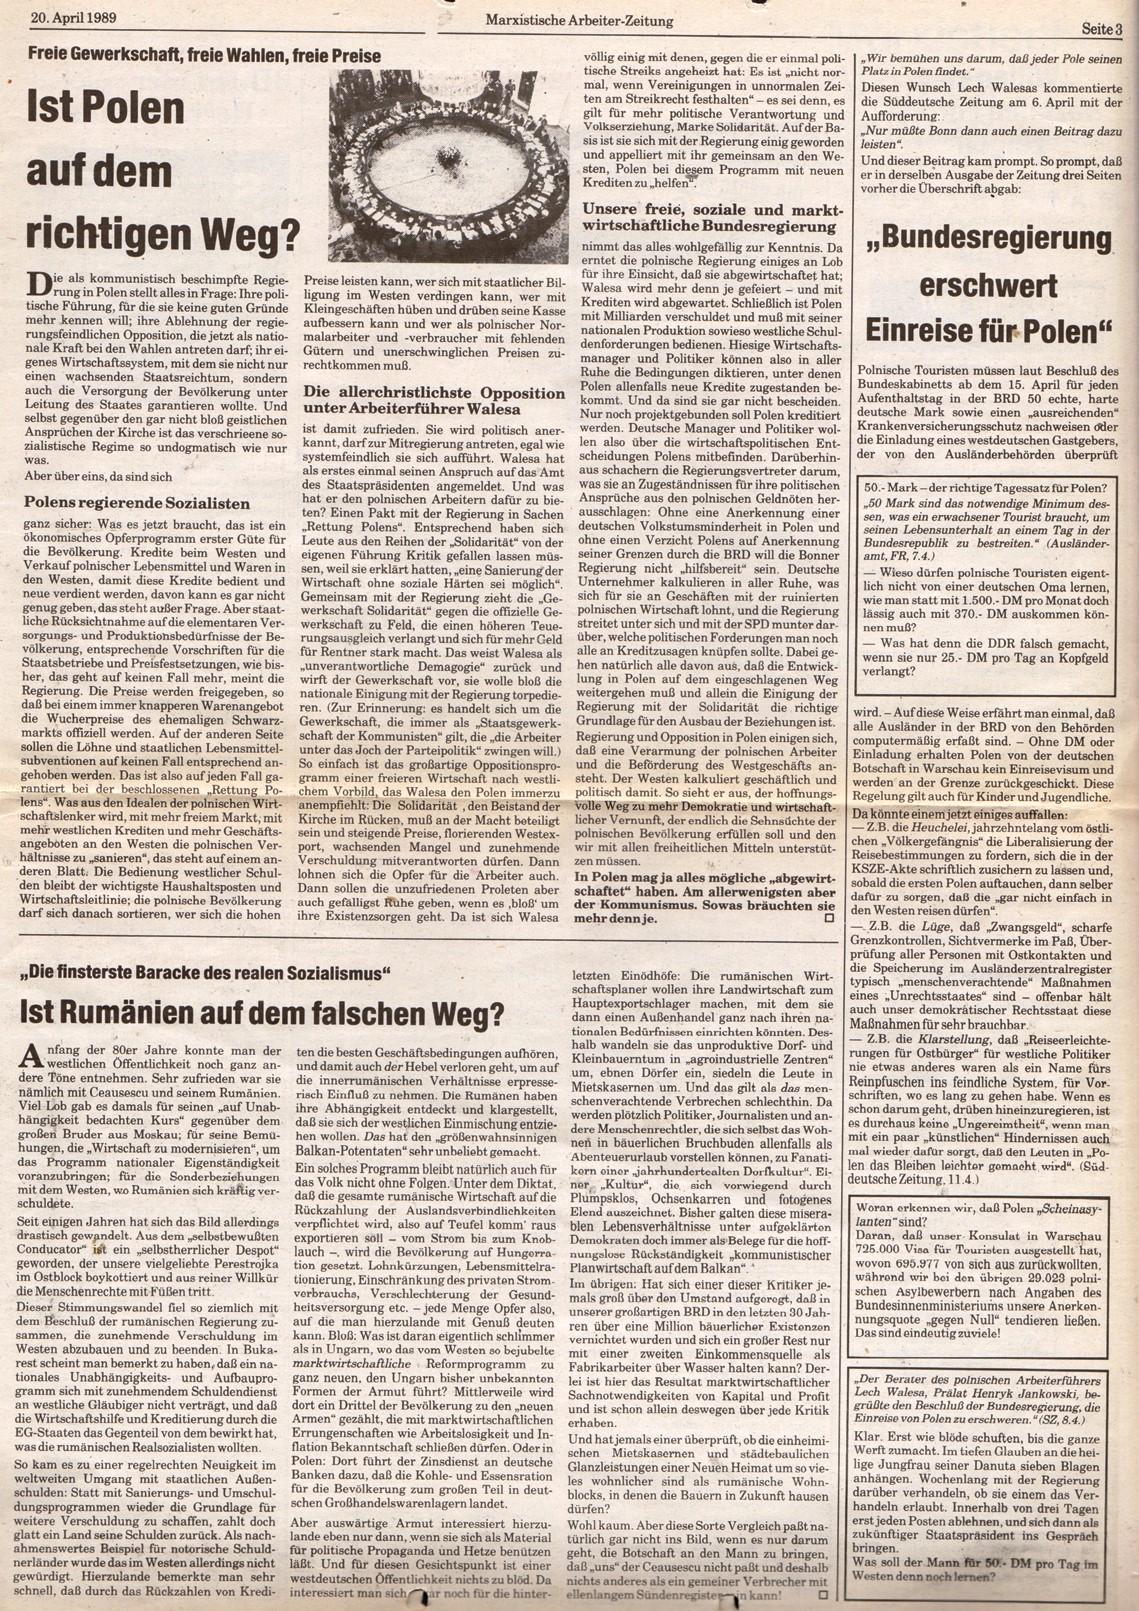 Muenchen_MG_MAZ_19890420_03